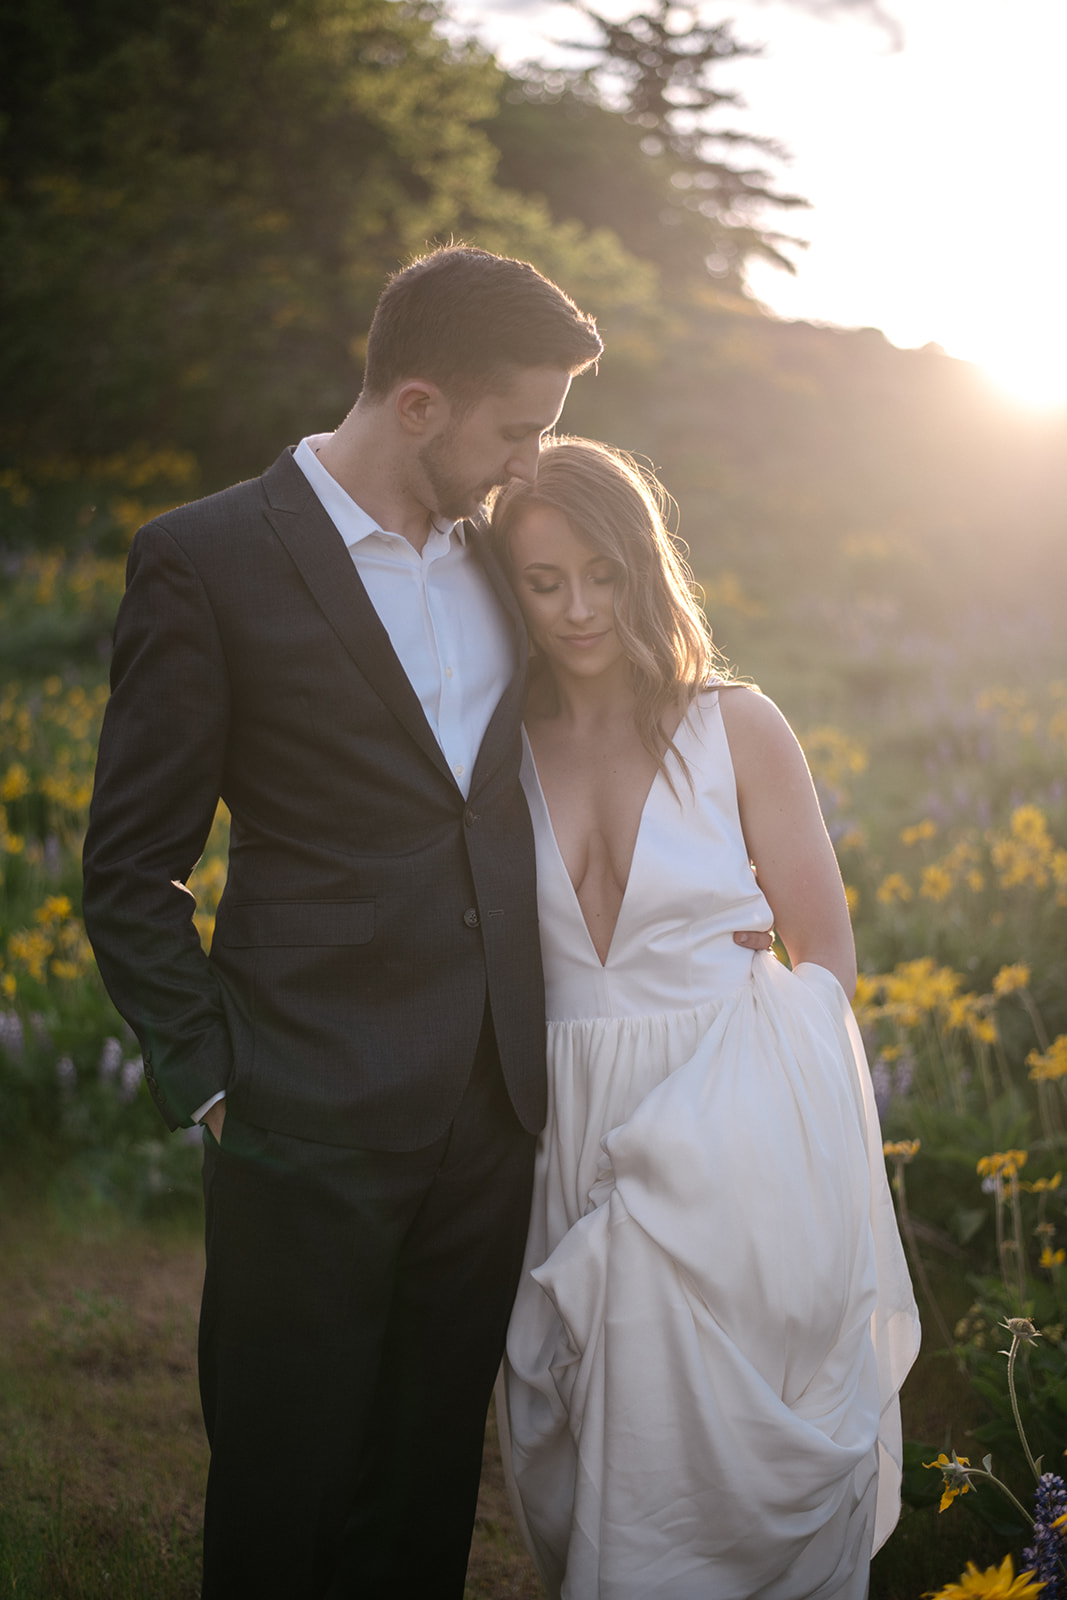 kamea_events_wedding_planner_portland_DeusAmor72.jpg